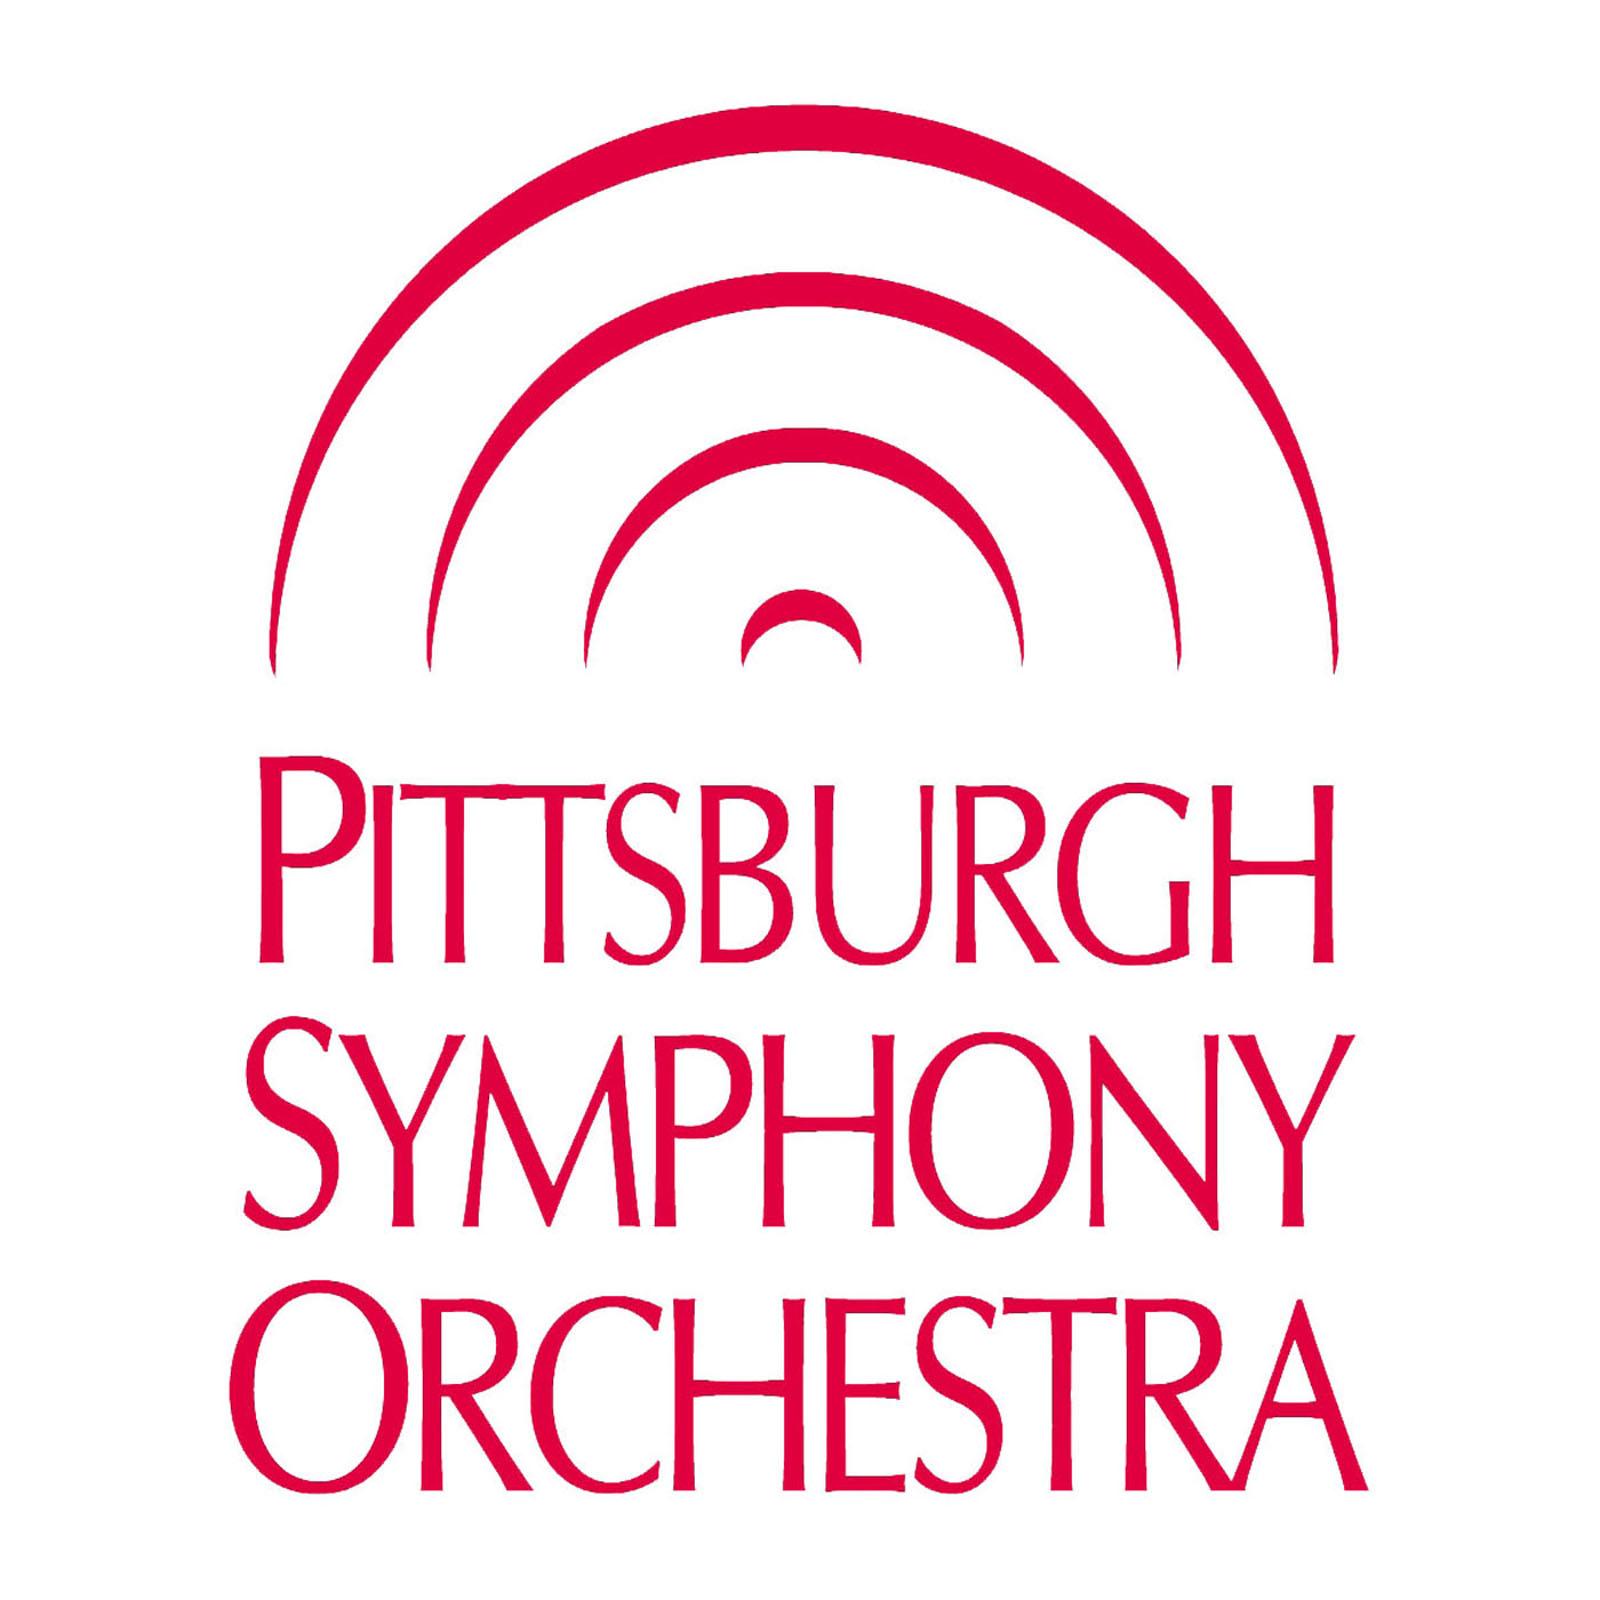 Pittsburgh Symphony Orchestra logo